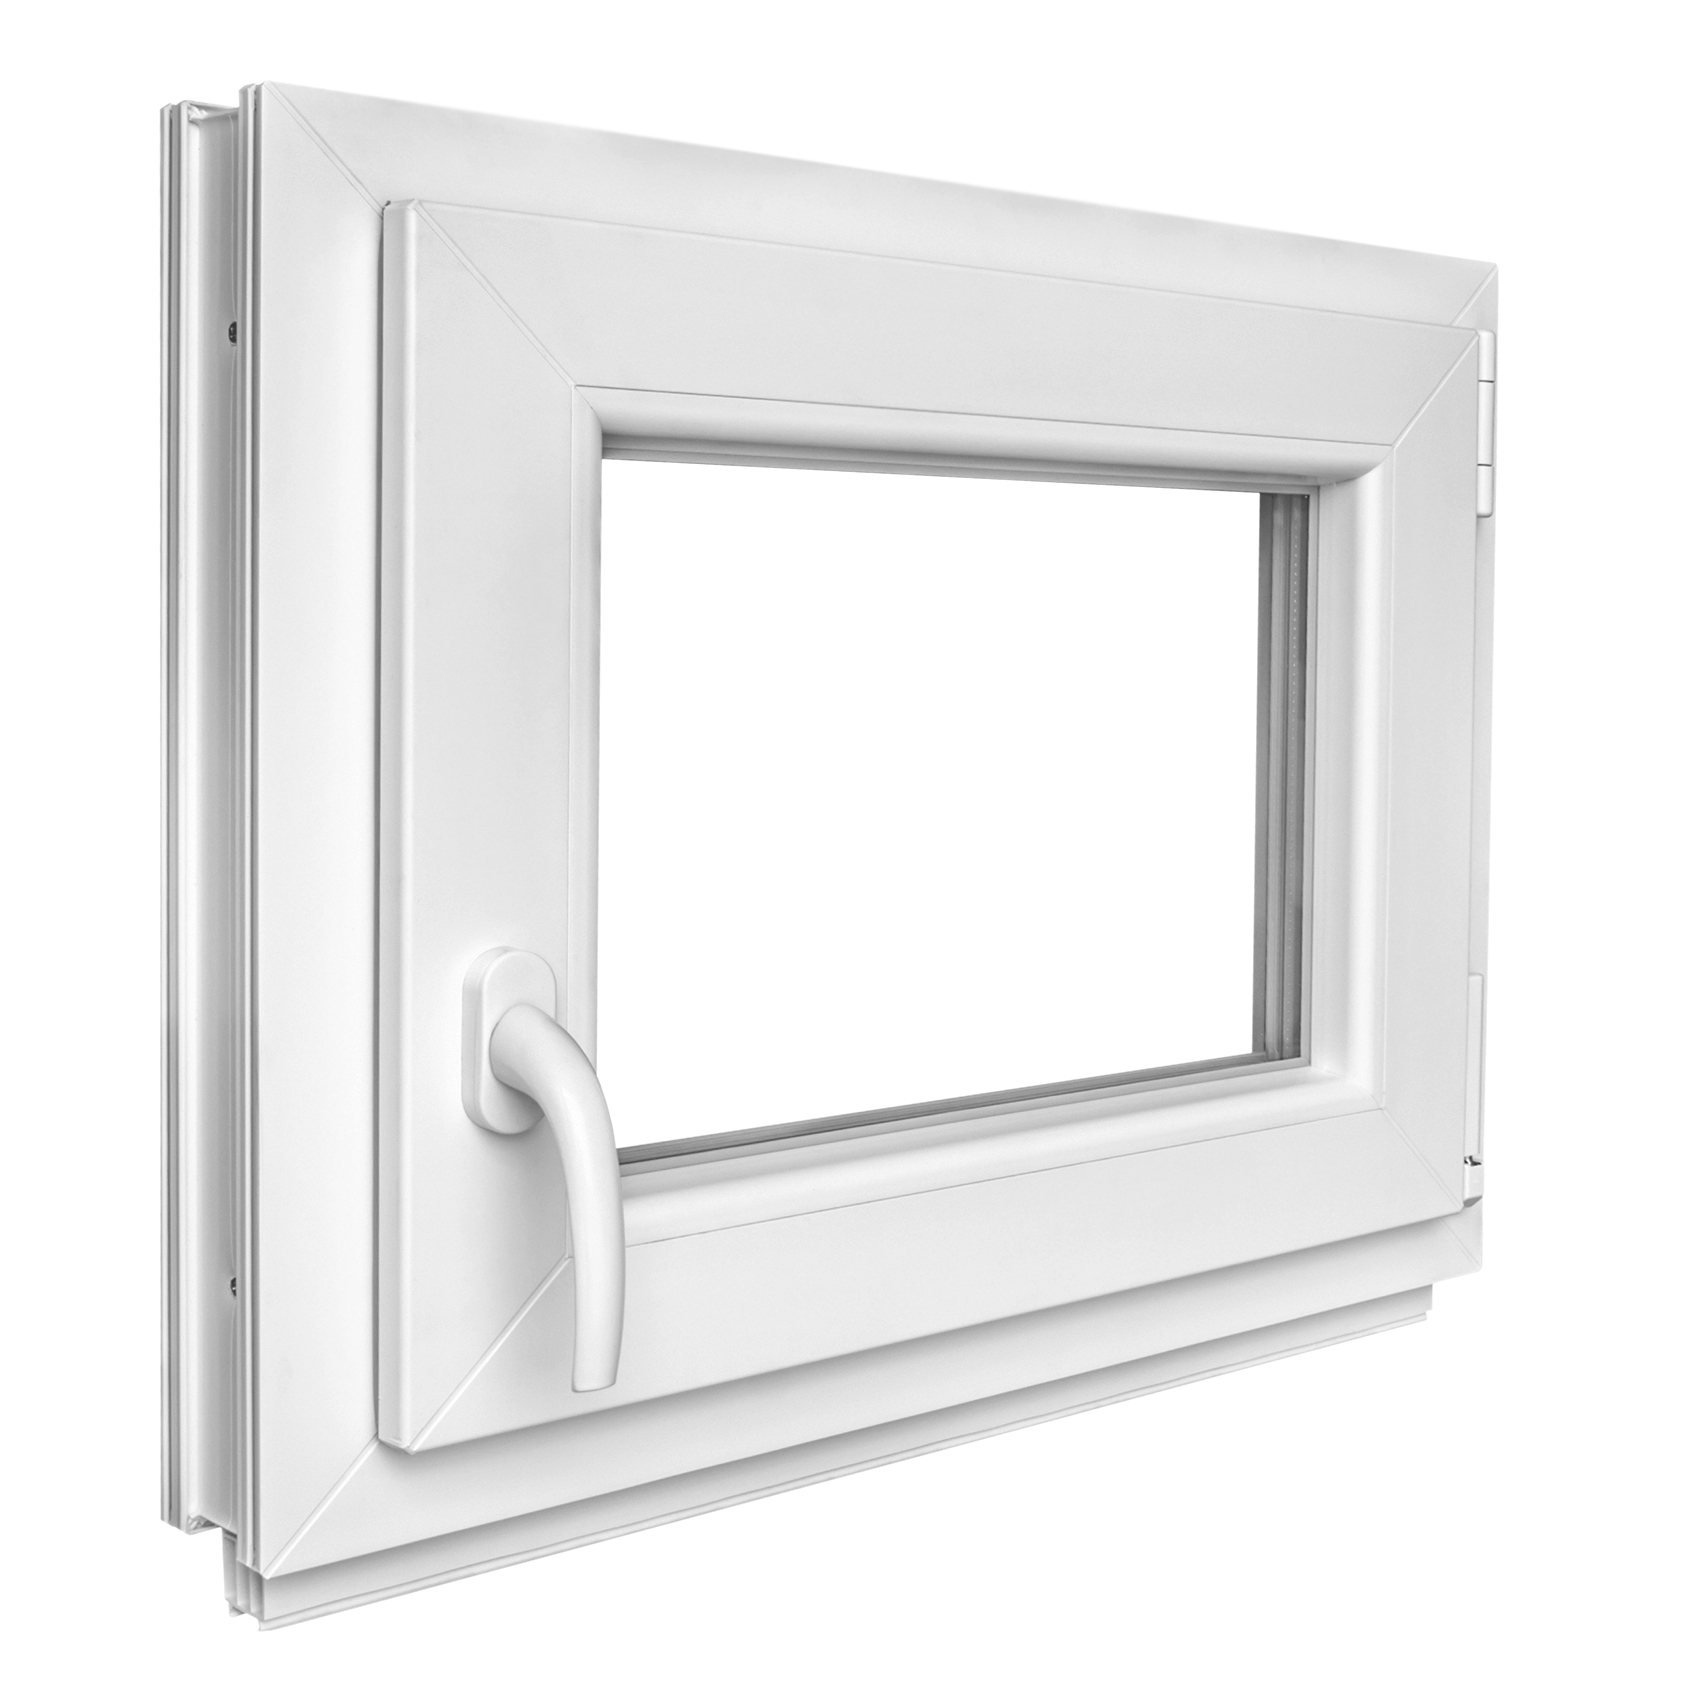 Kunststofffenster kellerfenster fenster mit griff 50x50cm dreh kipp winkhaus ebay for Kunststofffenster kellerfenster